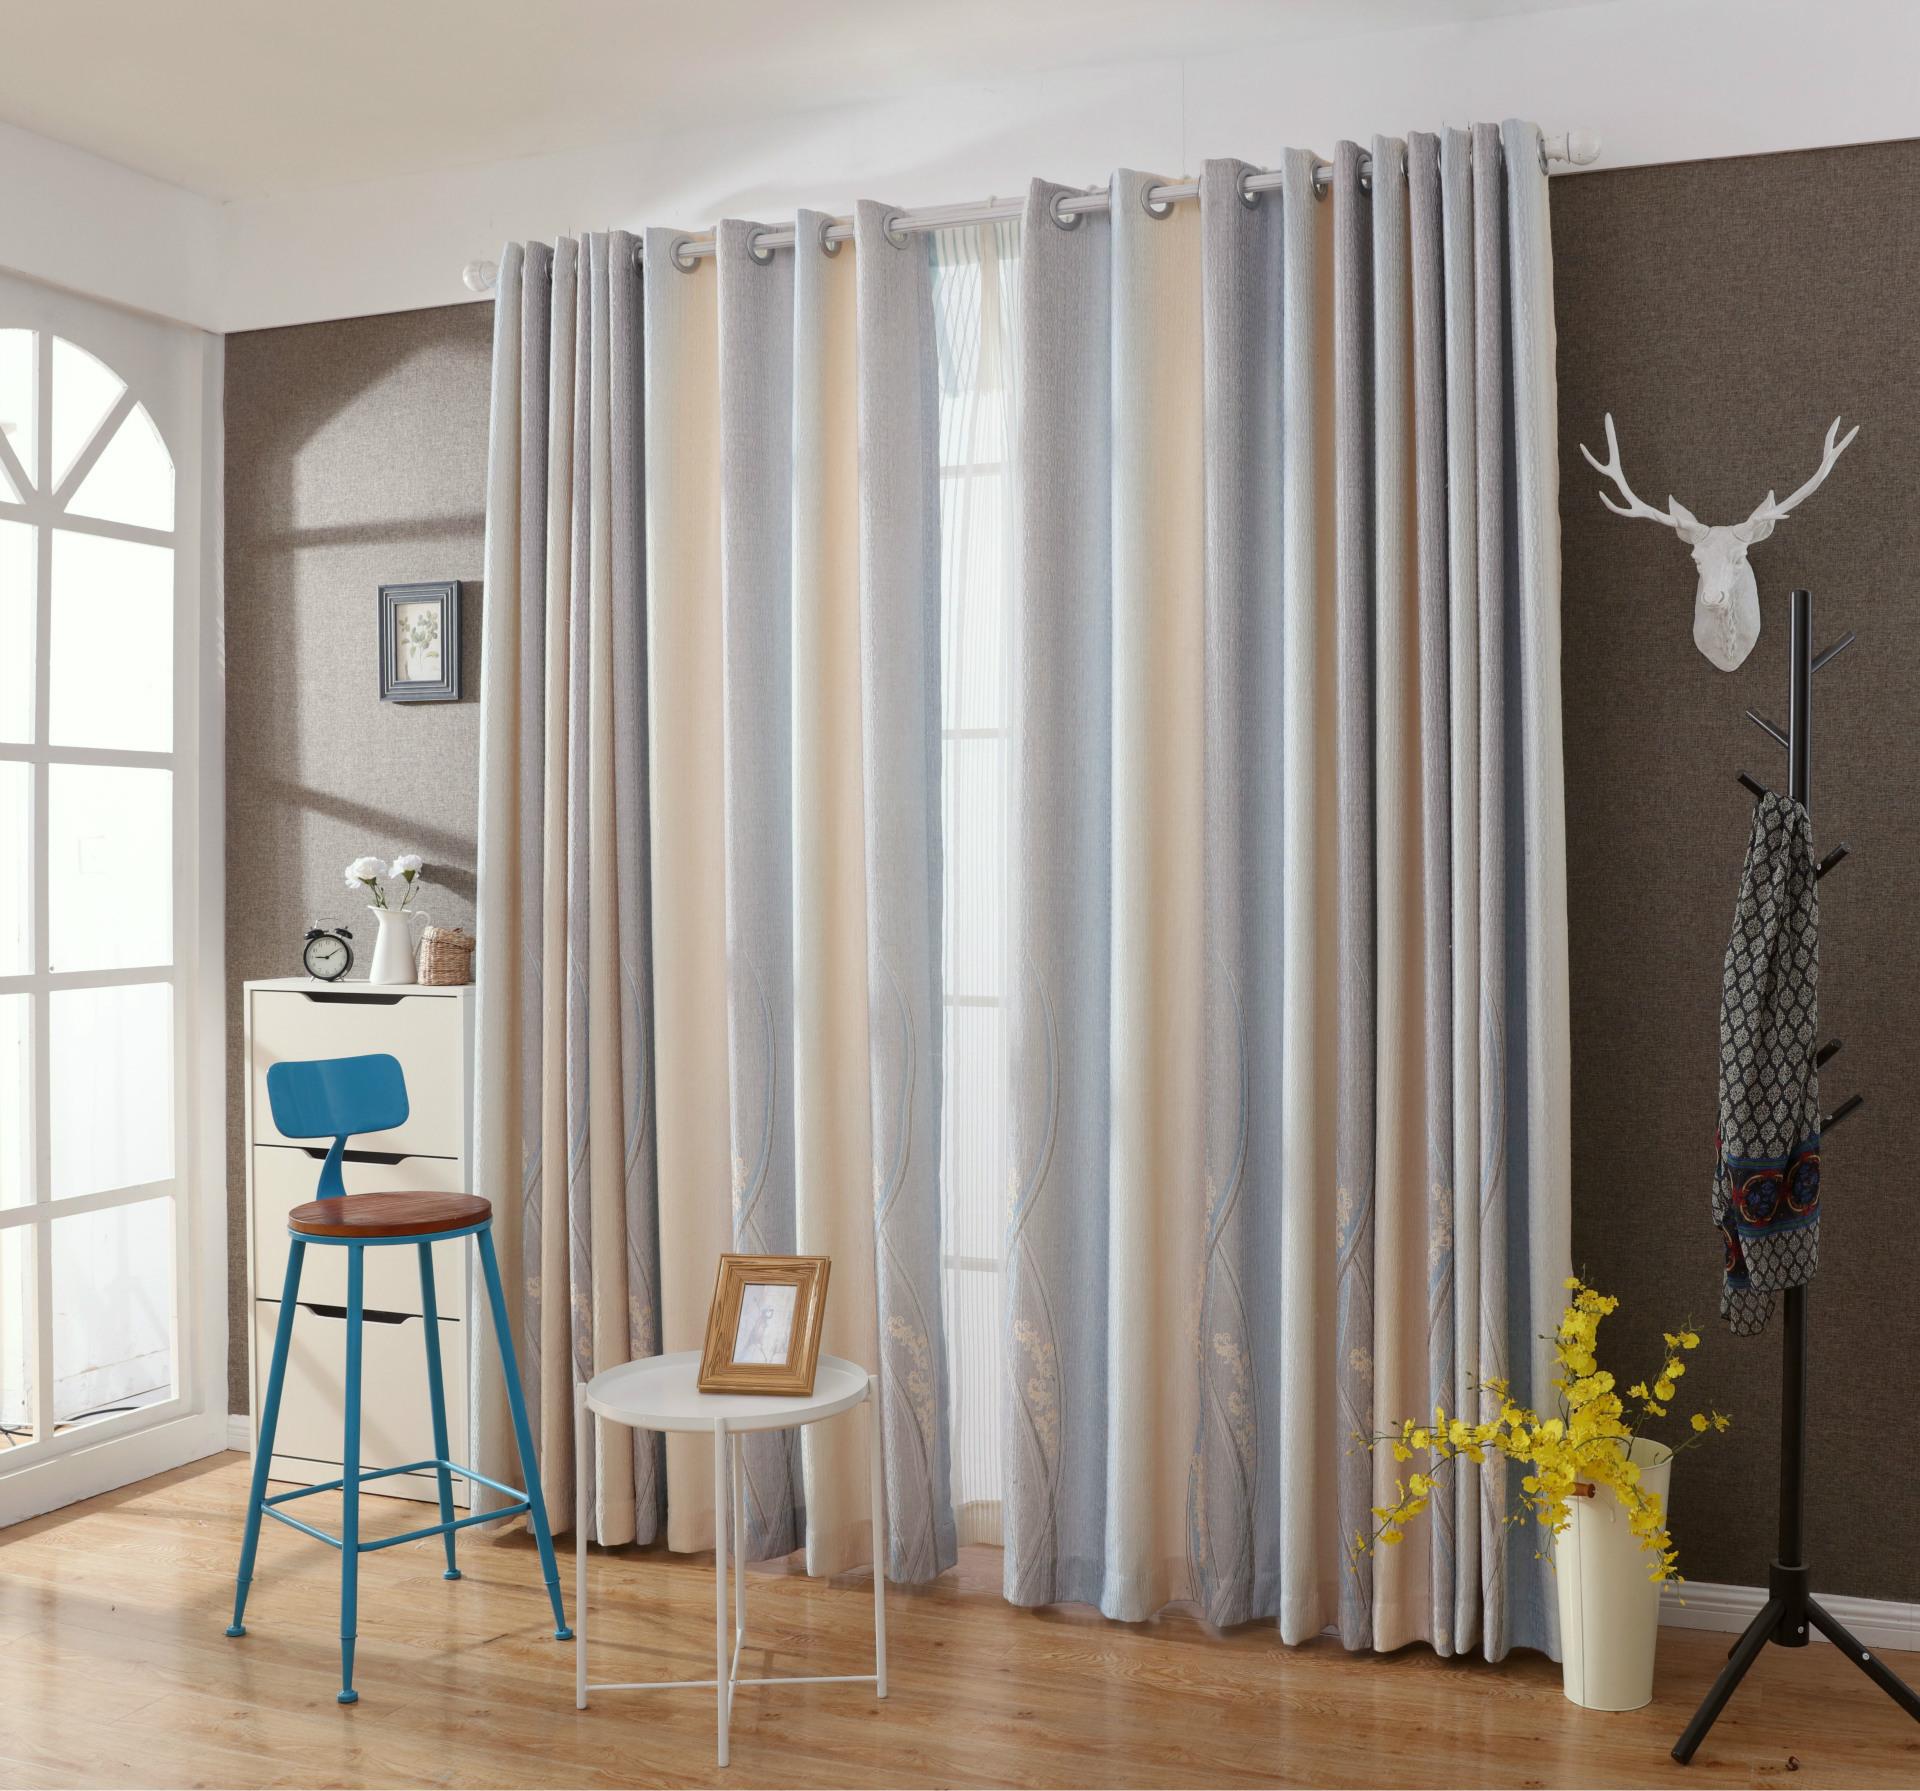 moda moderno flocado banda es simple cortinas de saln comedor mainland